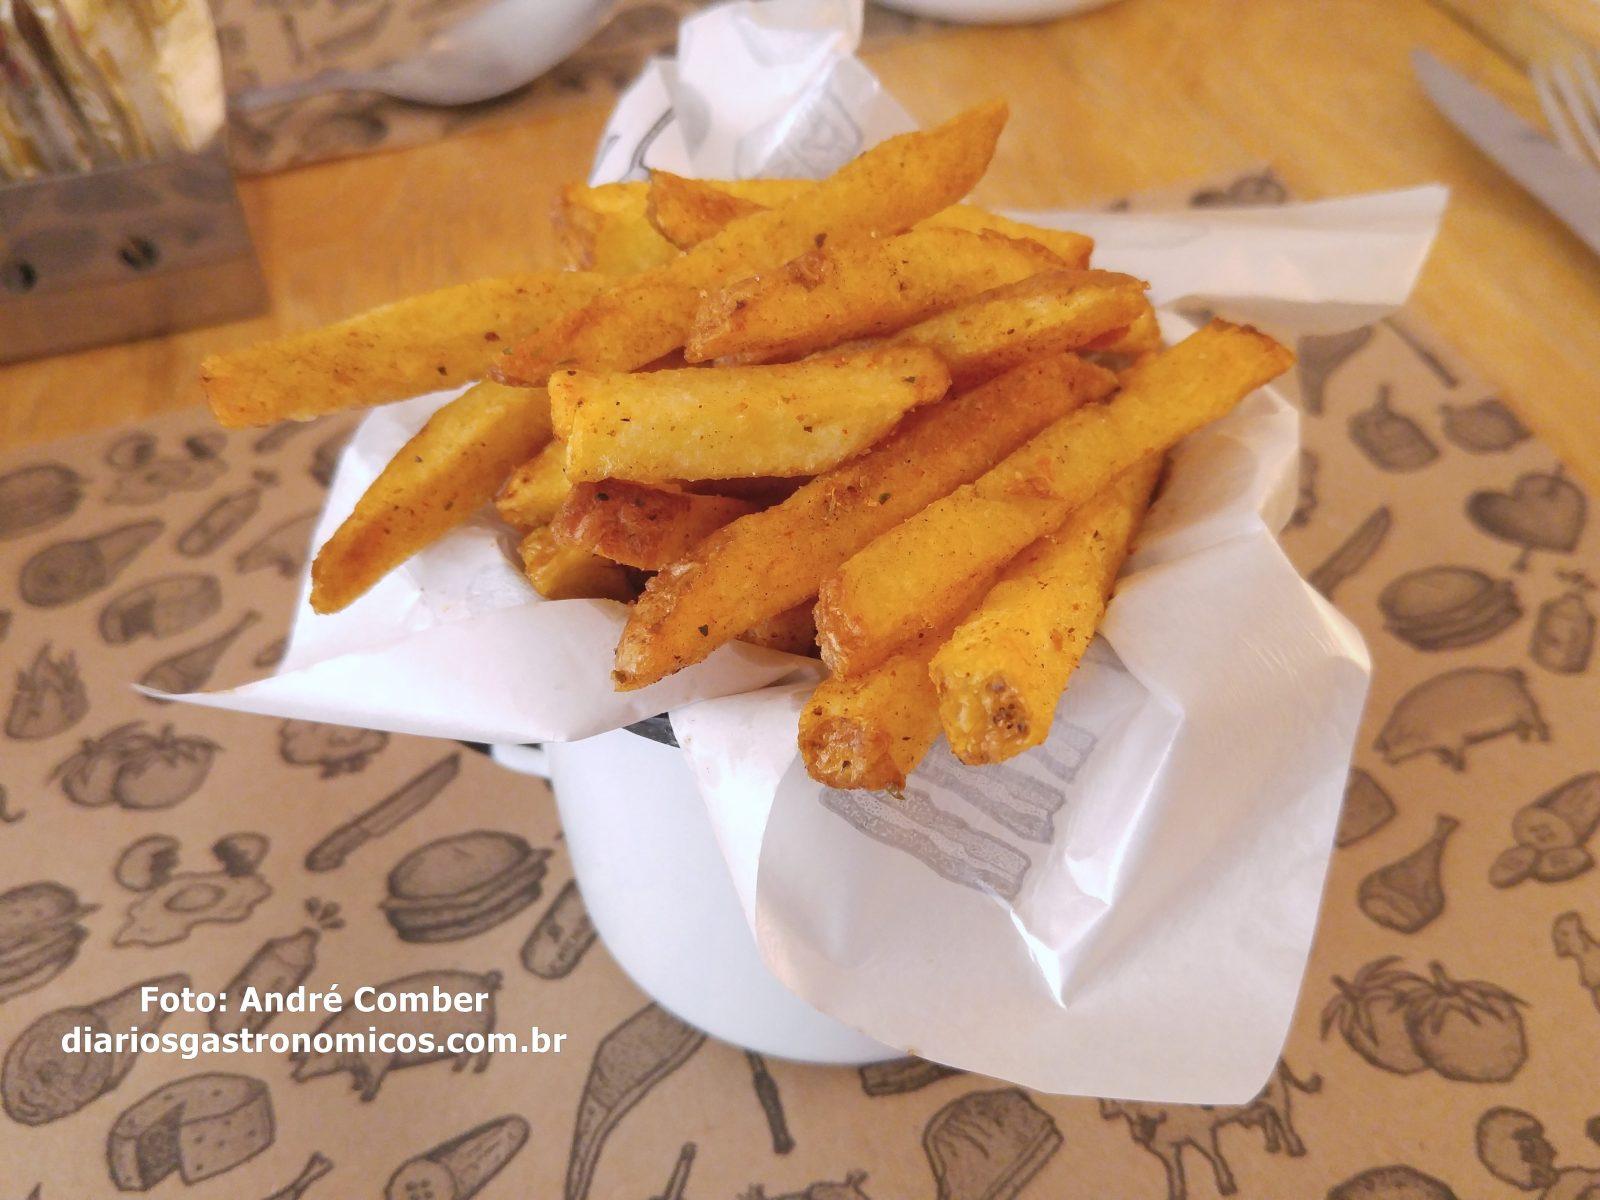 Kod, fritas, restaurante